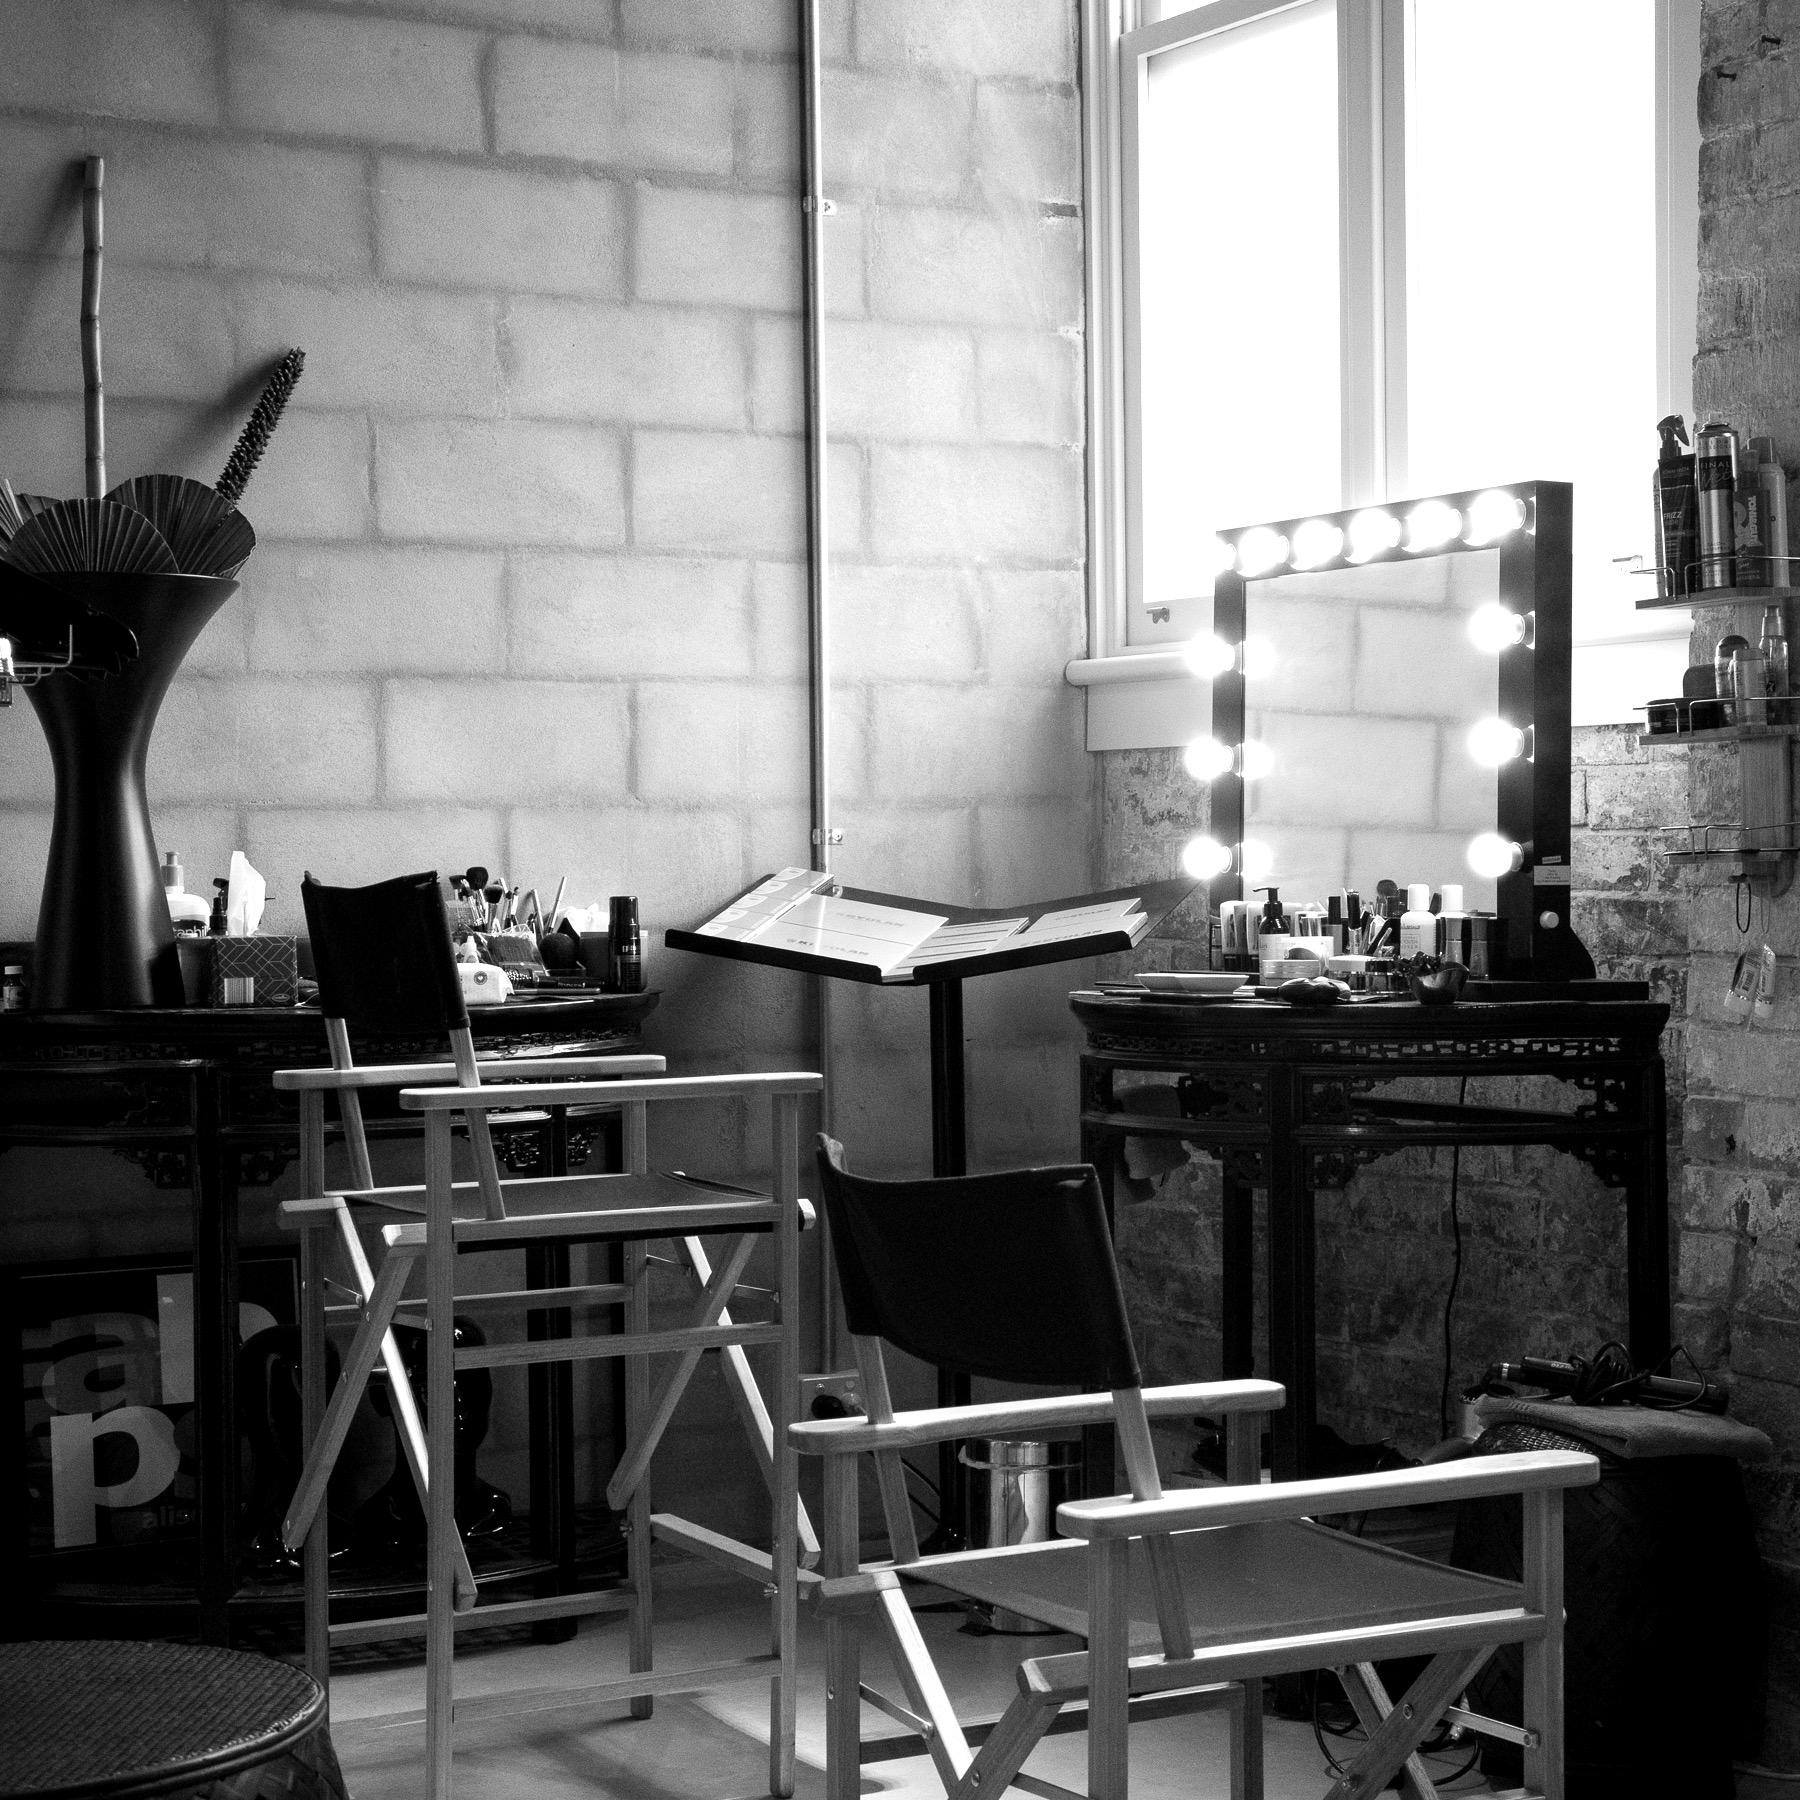 Alise Black Photographic Studios makeup